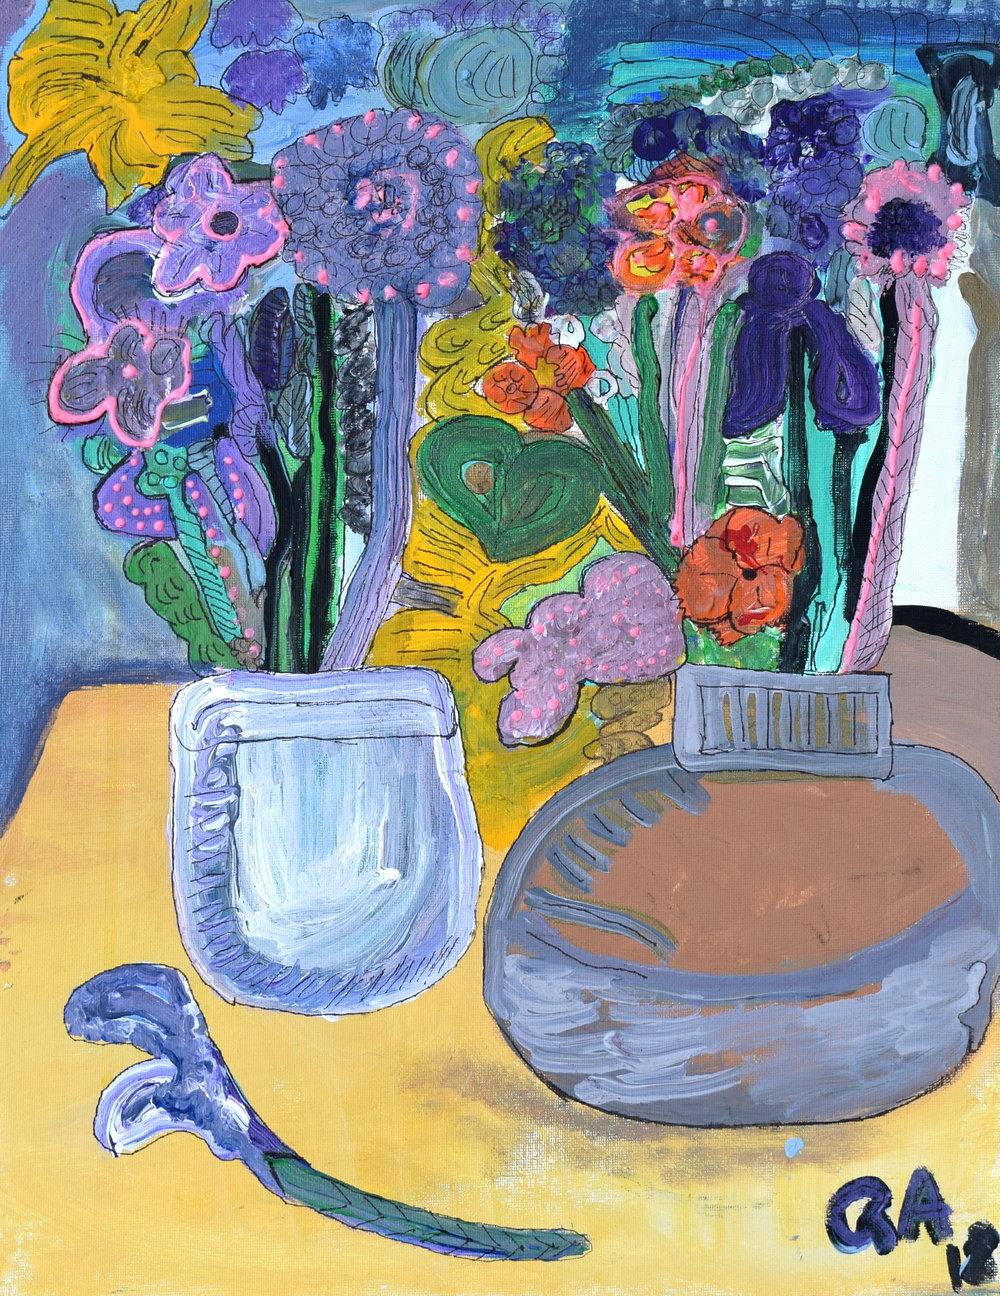 Floral Still Life Rachael Alhassan 2018 Acrylic on canvas NFS, $50